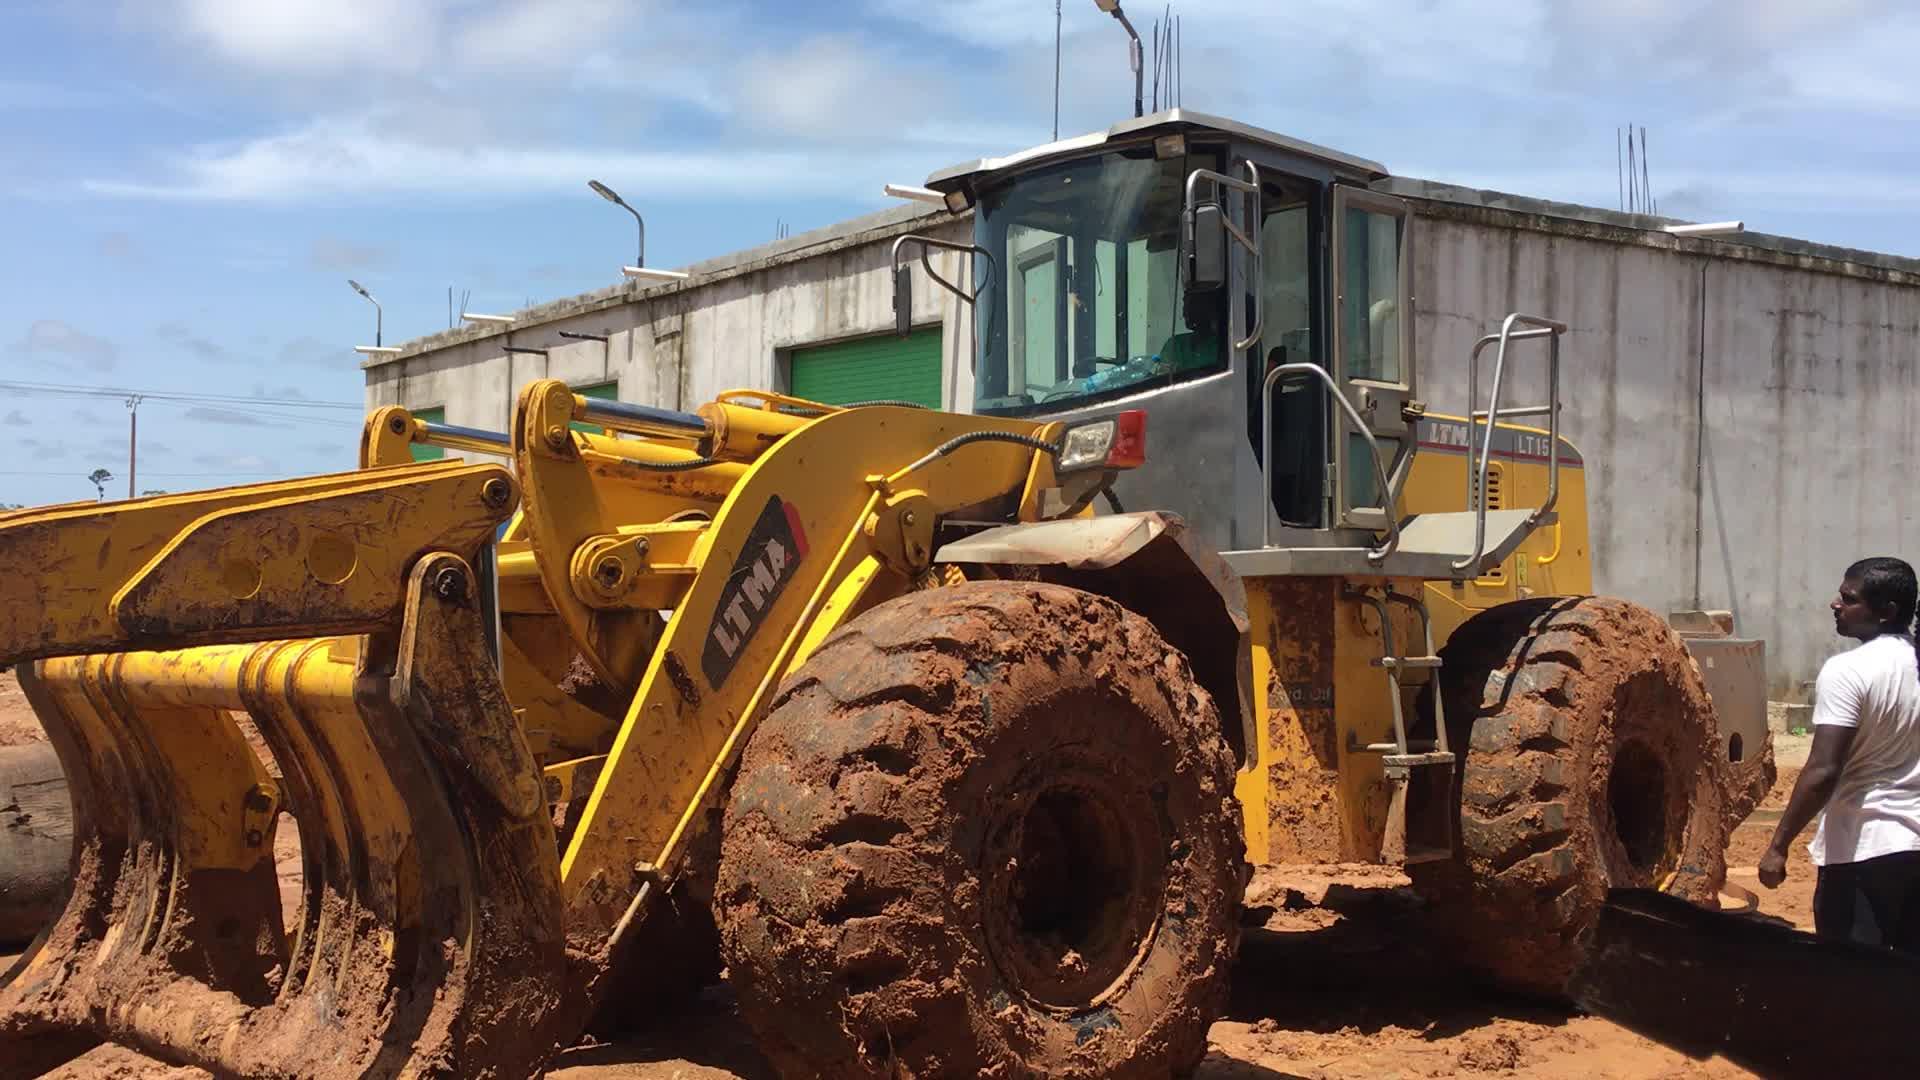 Verkauf von LTMG log greifer radlader 15 ton atv loader